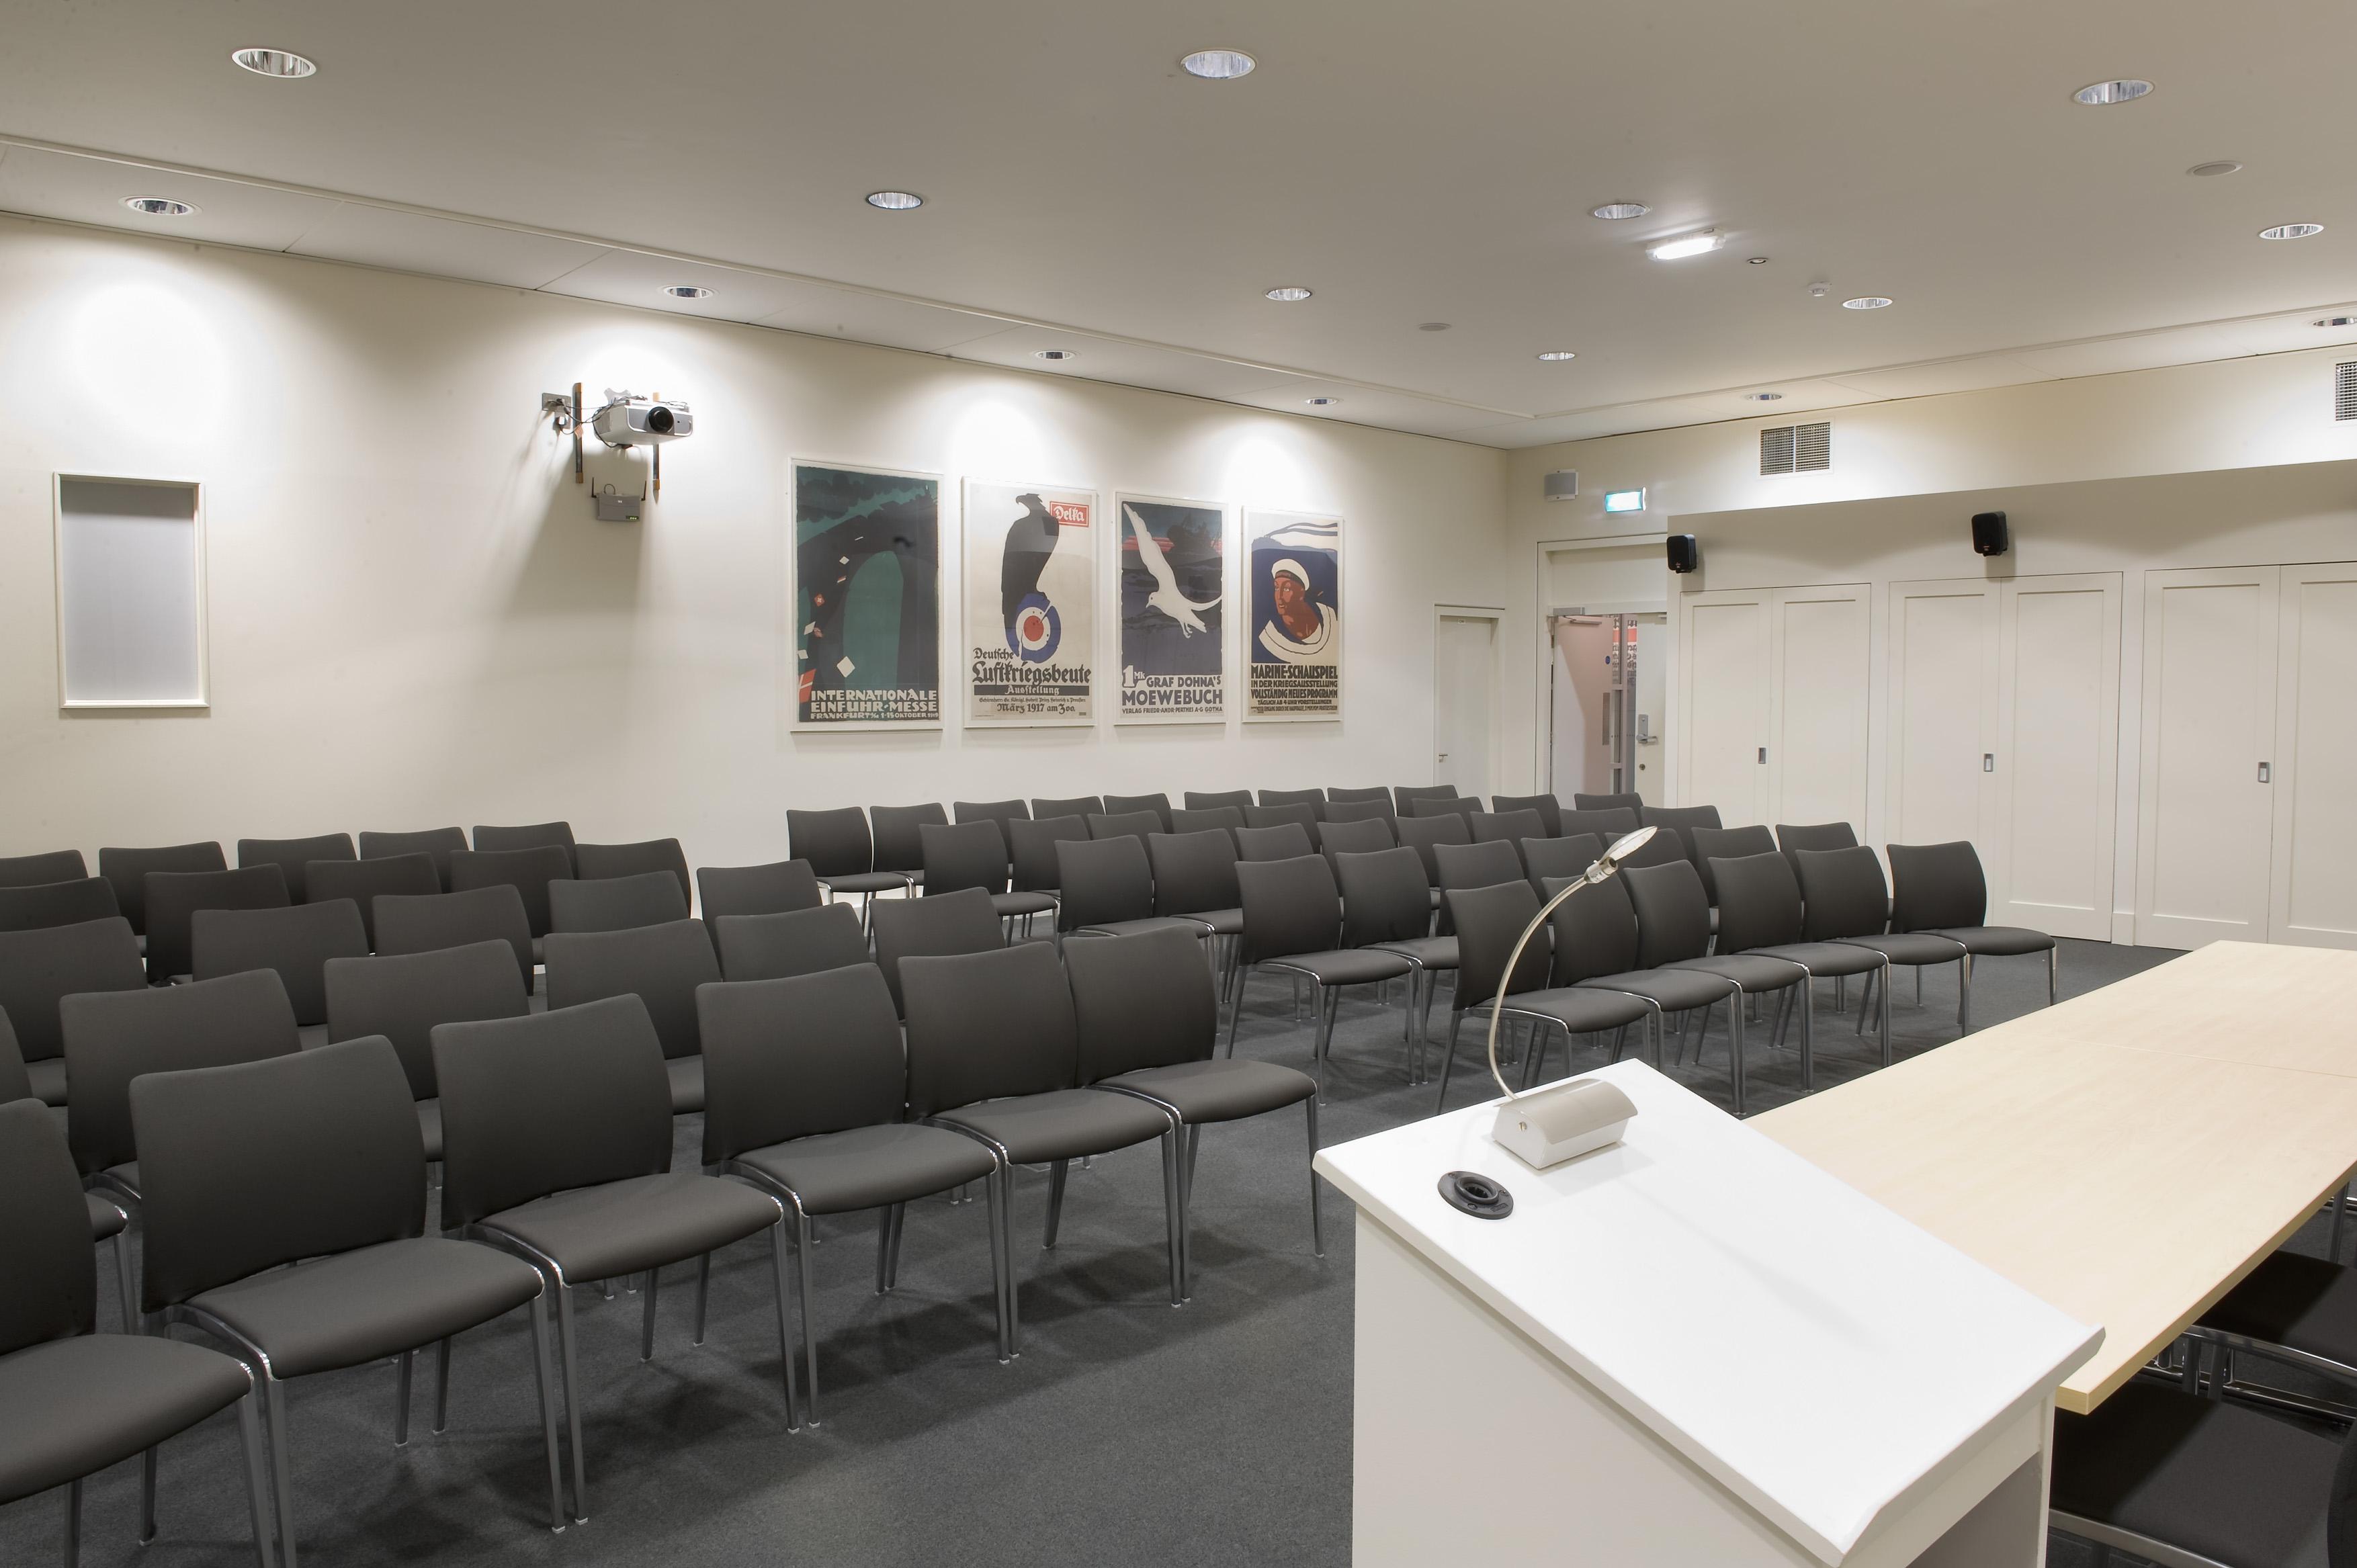 Imperial War Museum Meeting Rooms